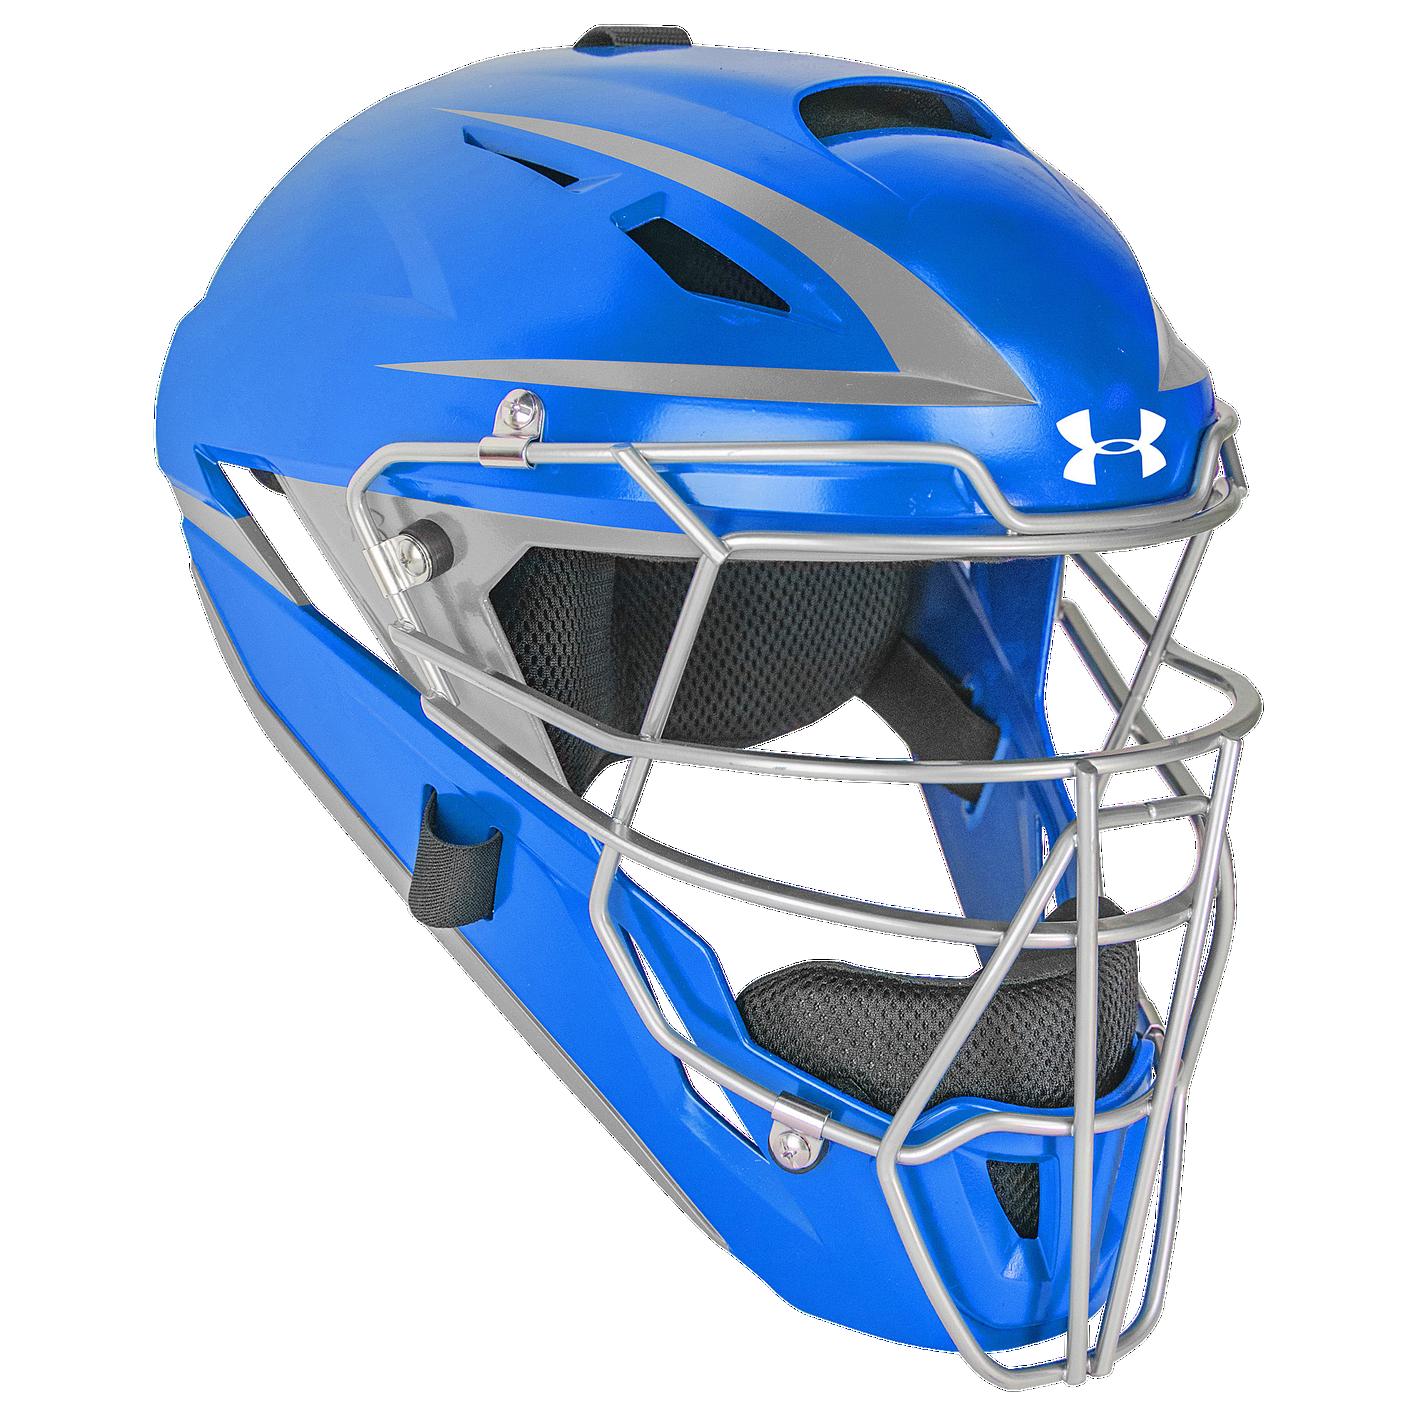 e5c3e5daa985a2 Under Armour Converge Catcher's Head Gear - Adult - Baseball - Sport ...